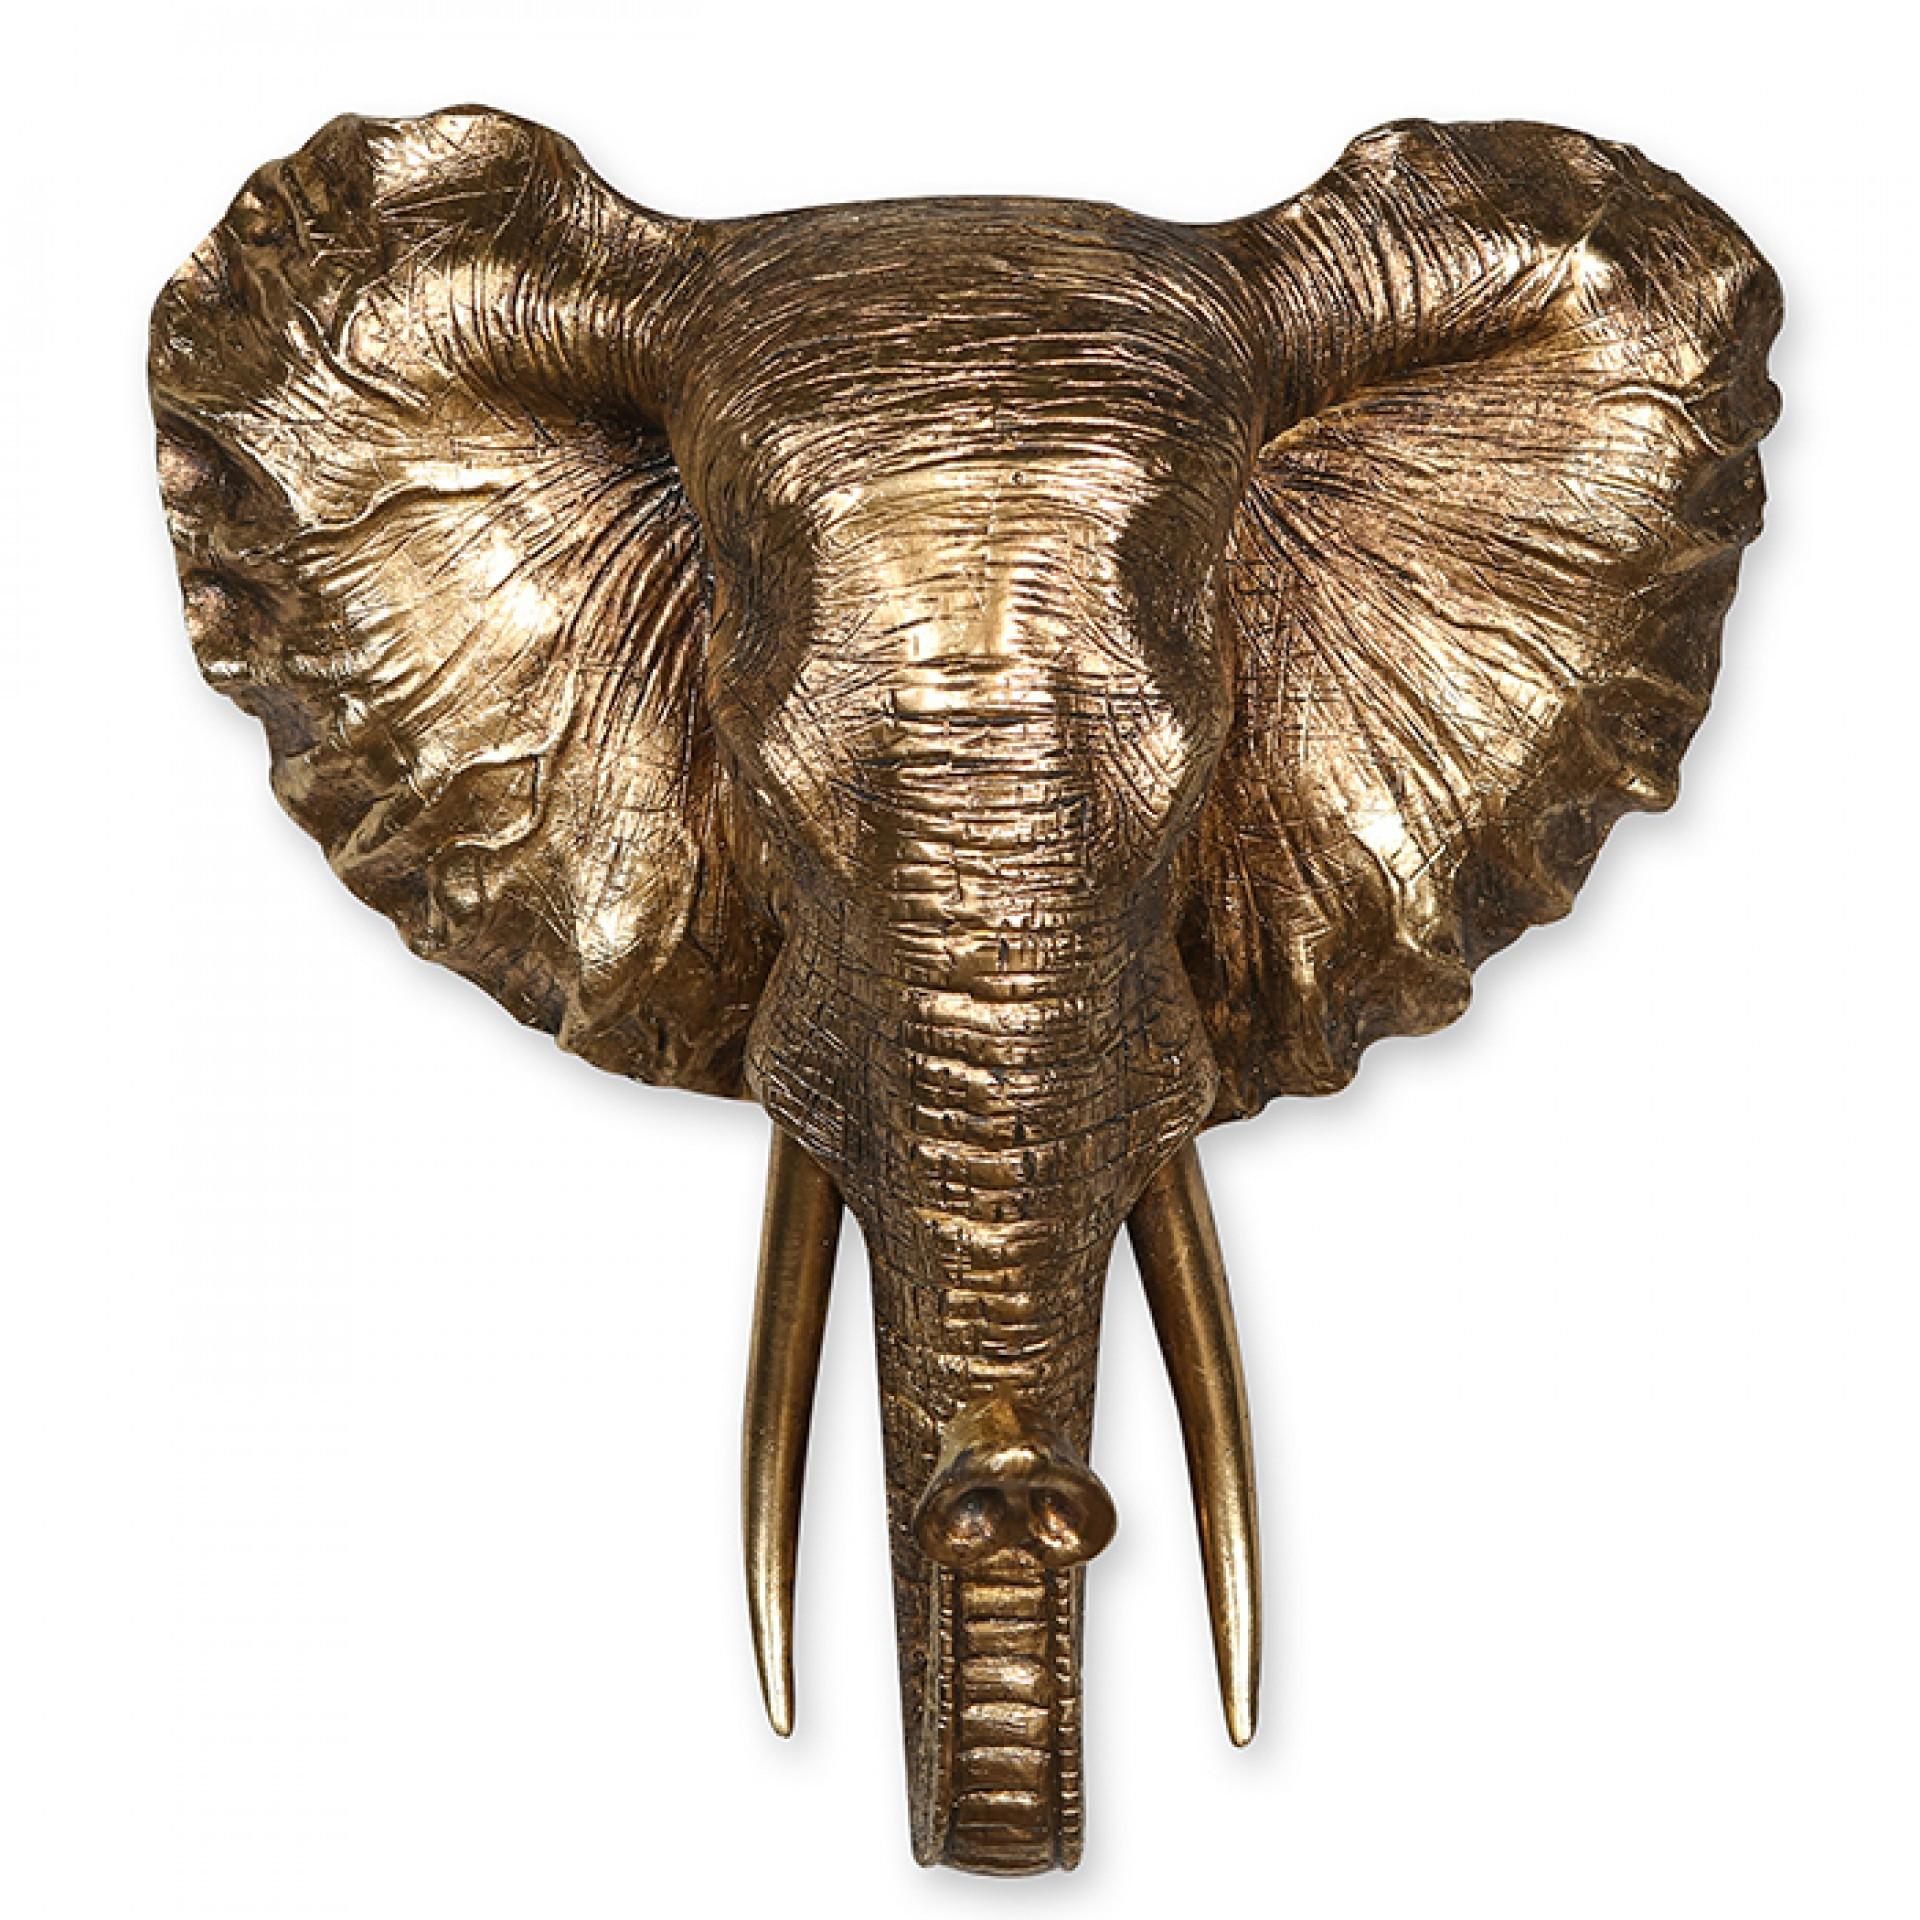 Nástěnná dekorace Elephant, 45 cm, zlatá